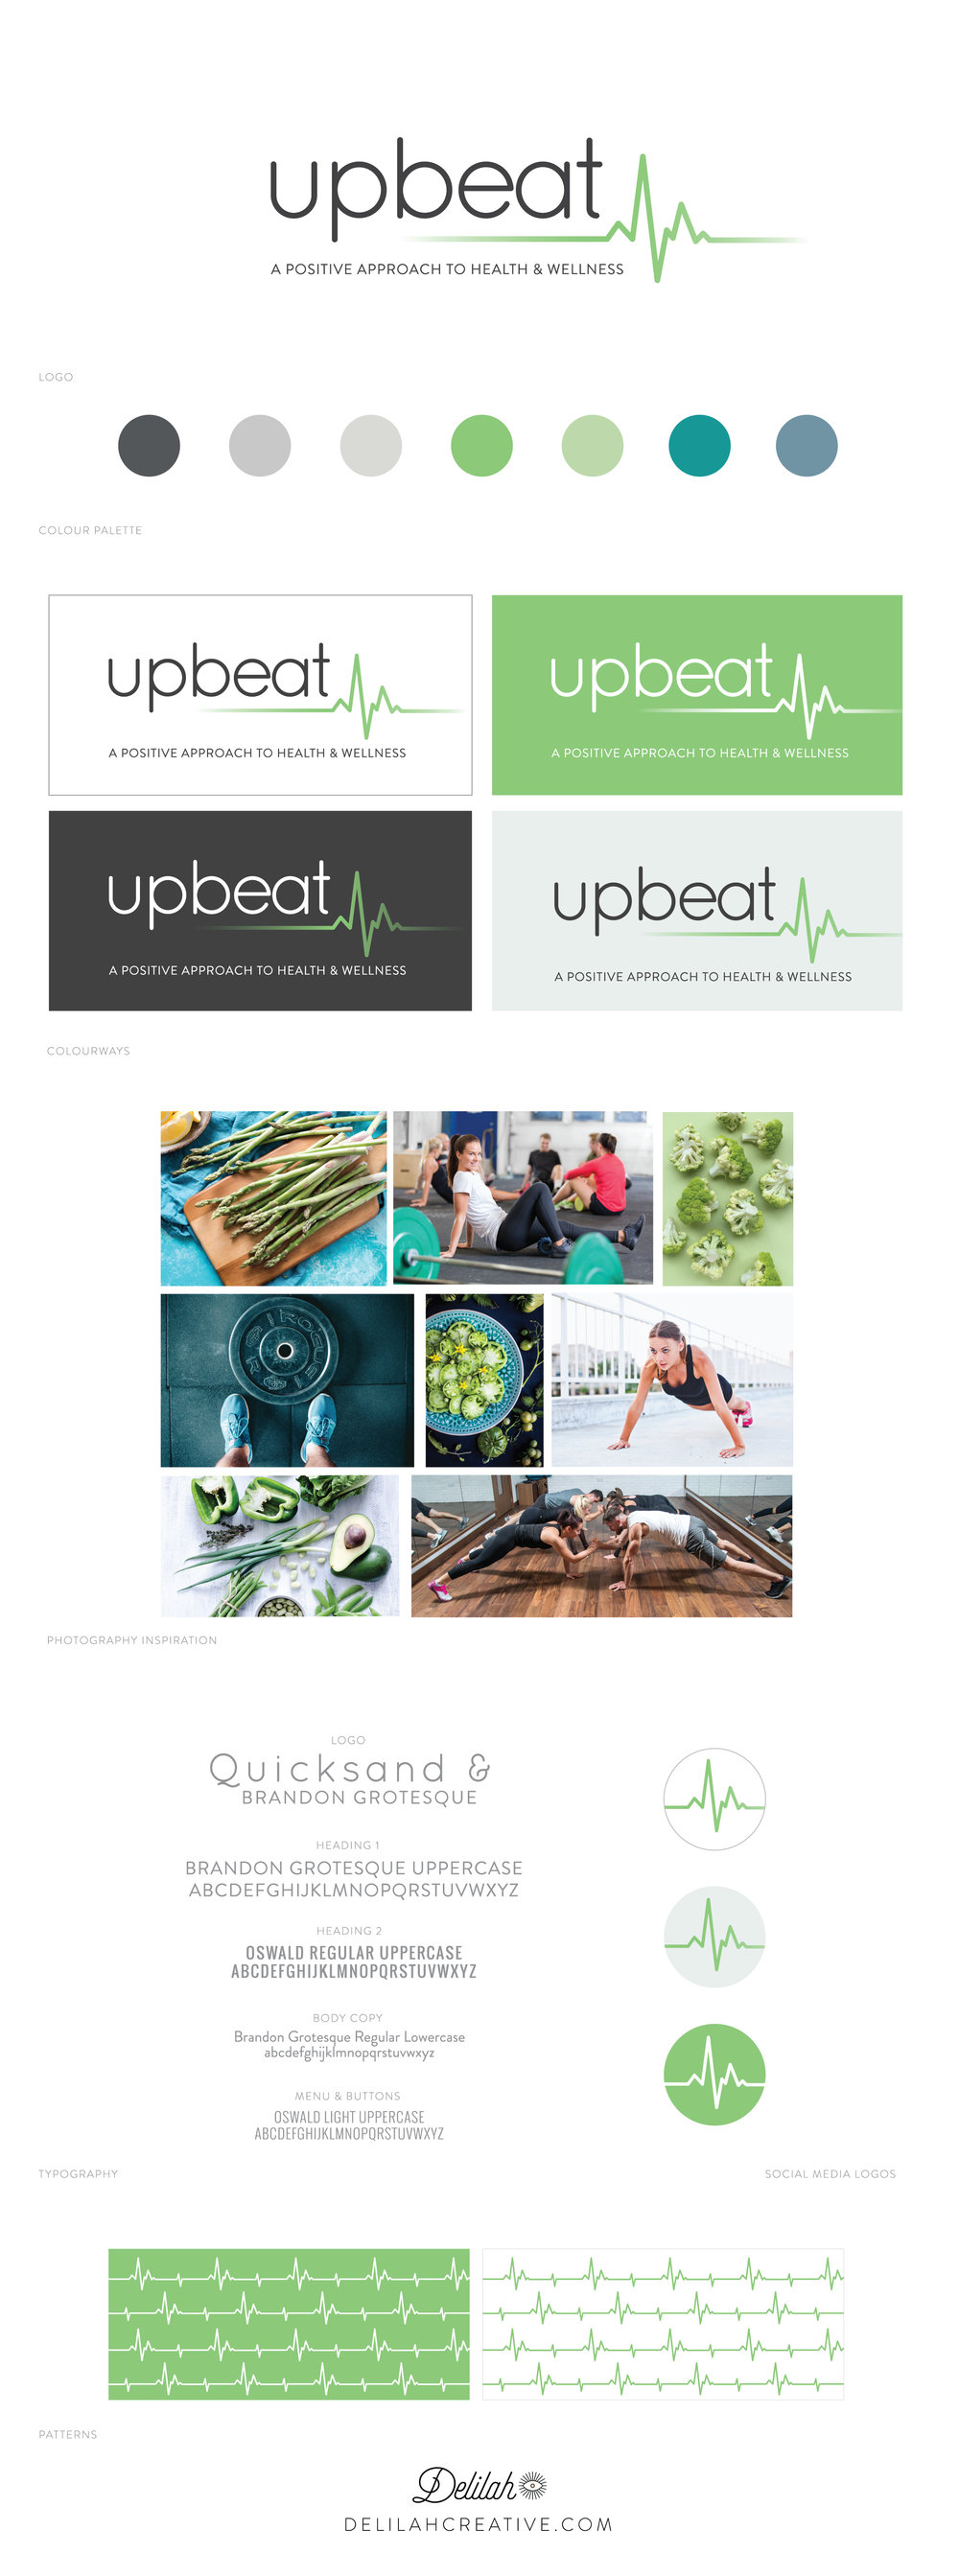 Upbeat - Pinterest-03.jpg